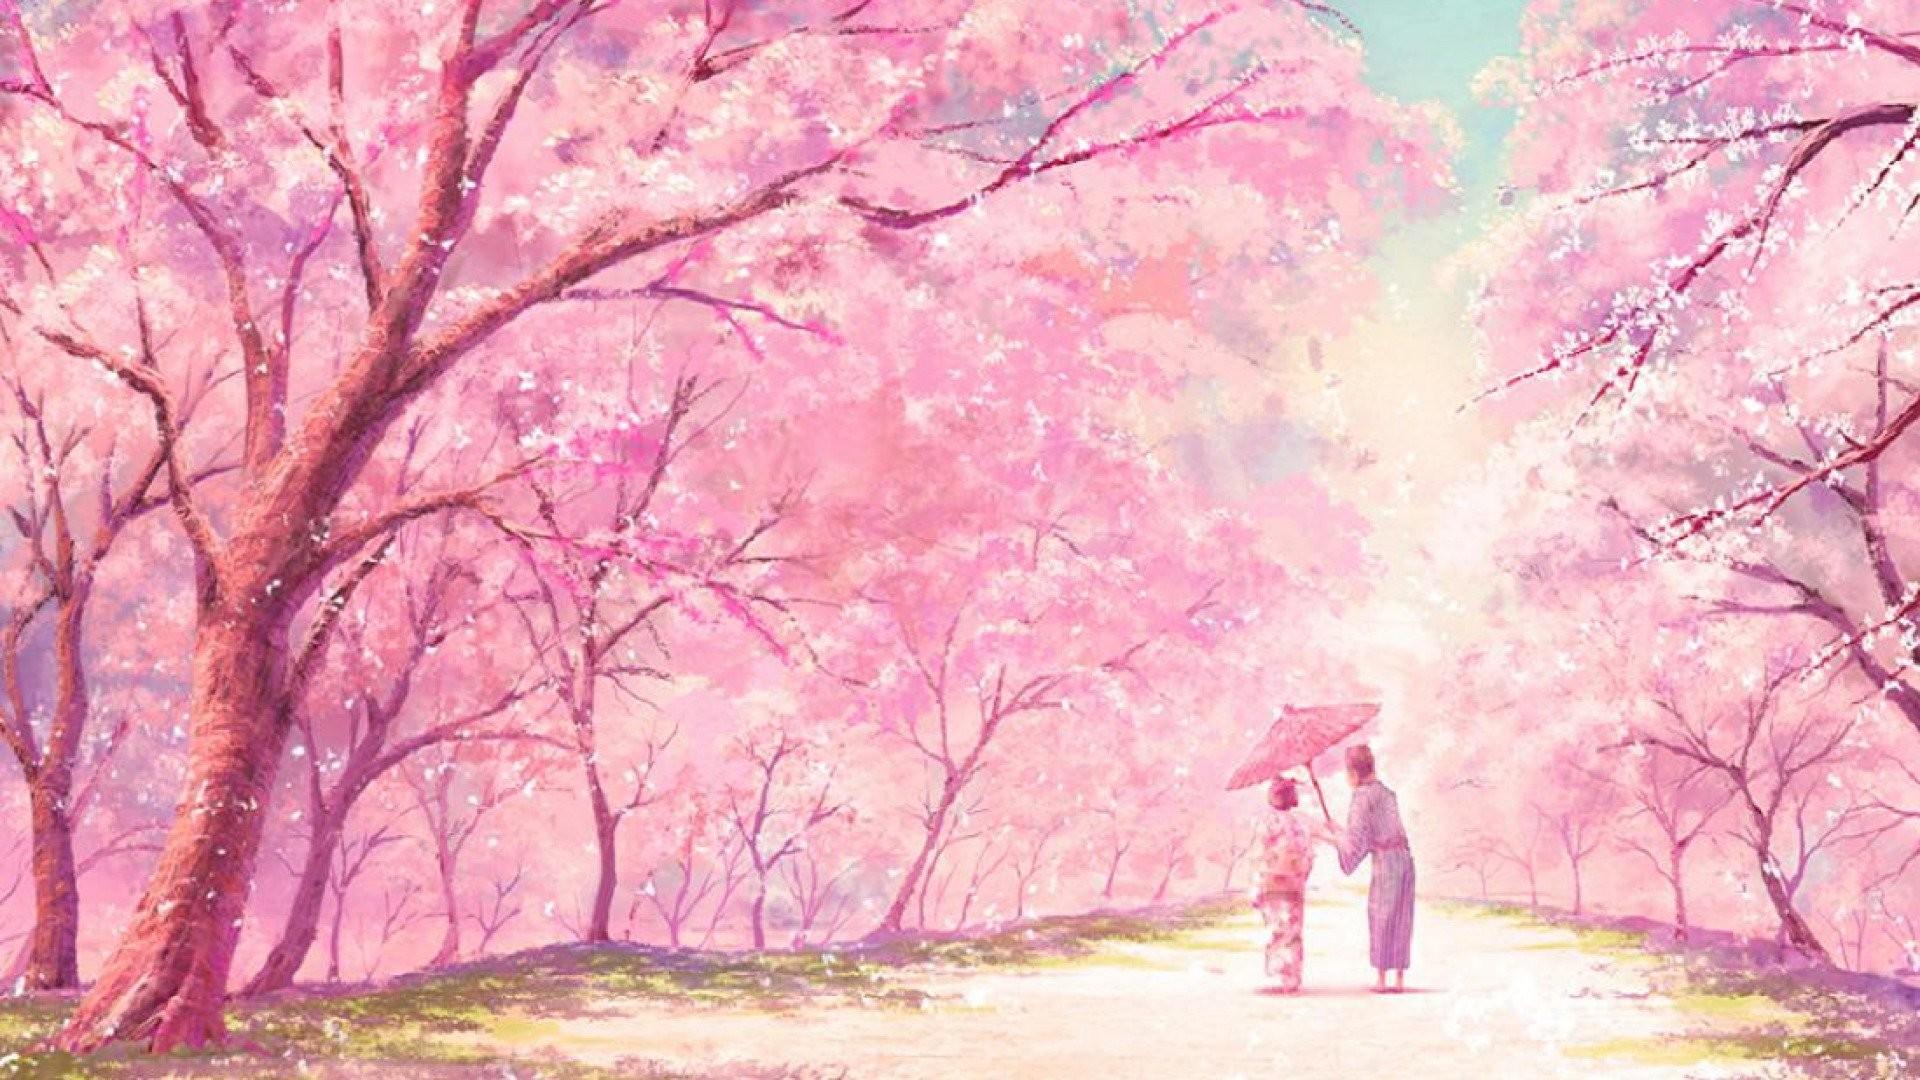 Japanese Cherry Blossom Anime 2296800 Hd Wallpaper